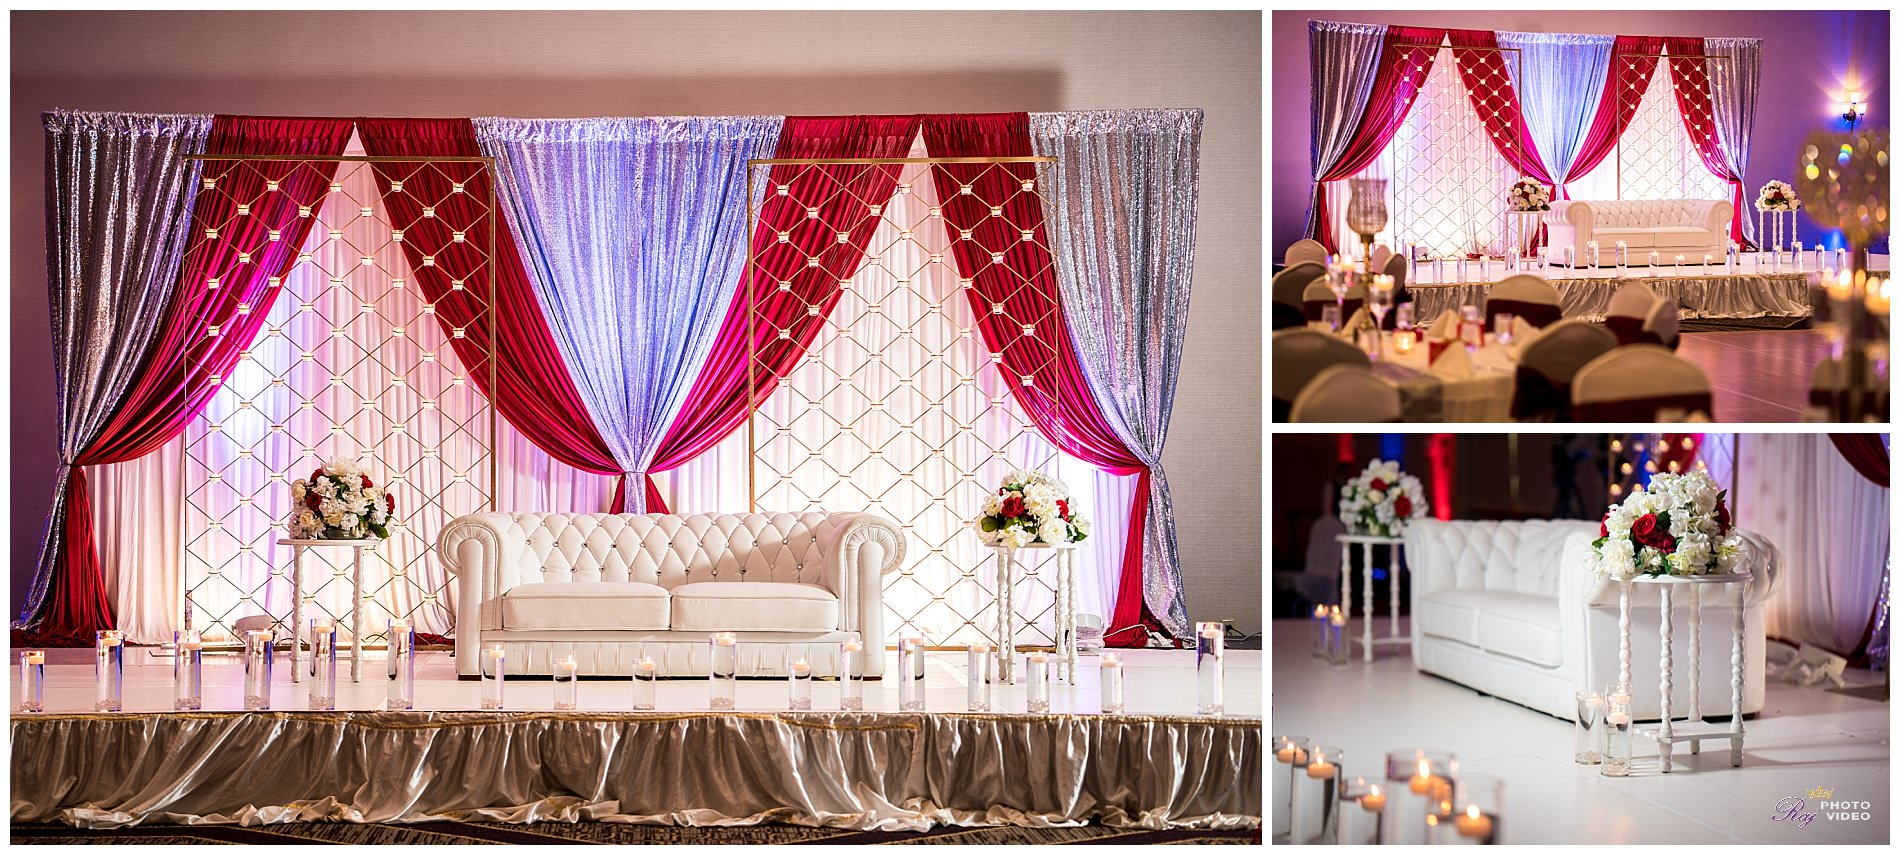 doubletree-by-hilton-hotel-wilmington-de-wedding-krishna-ritesh-93.jpg